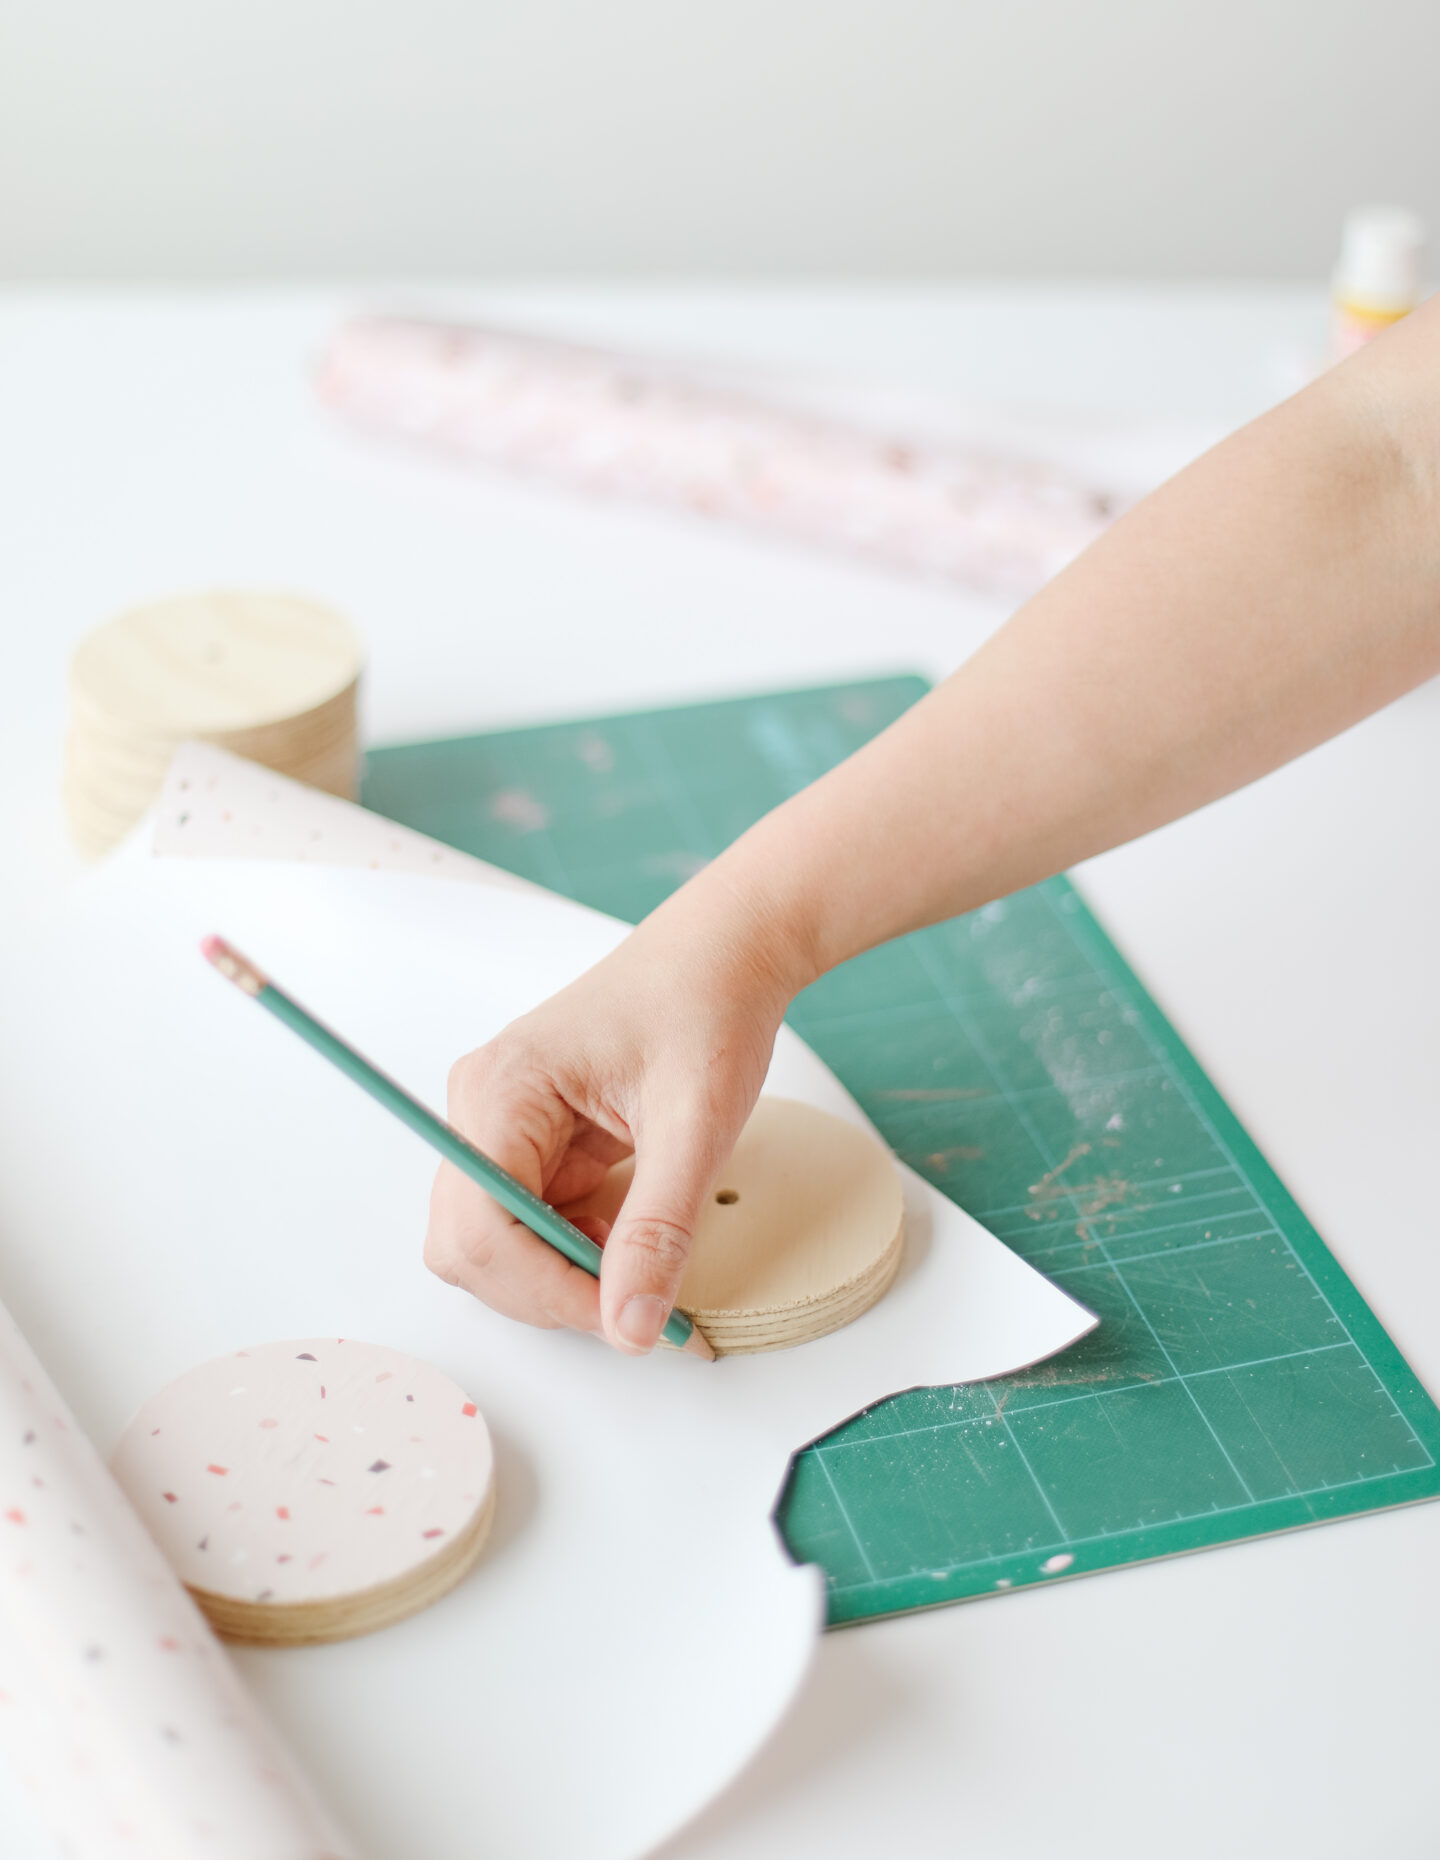 Terrazzo wrapping paper coasters DIY idea